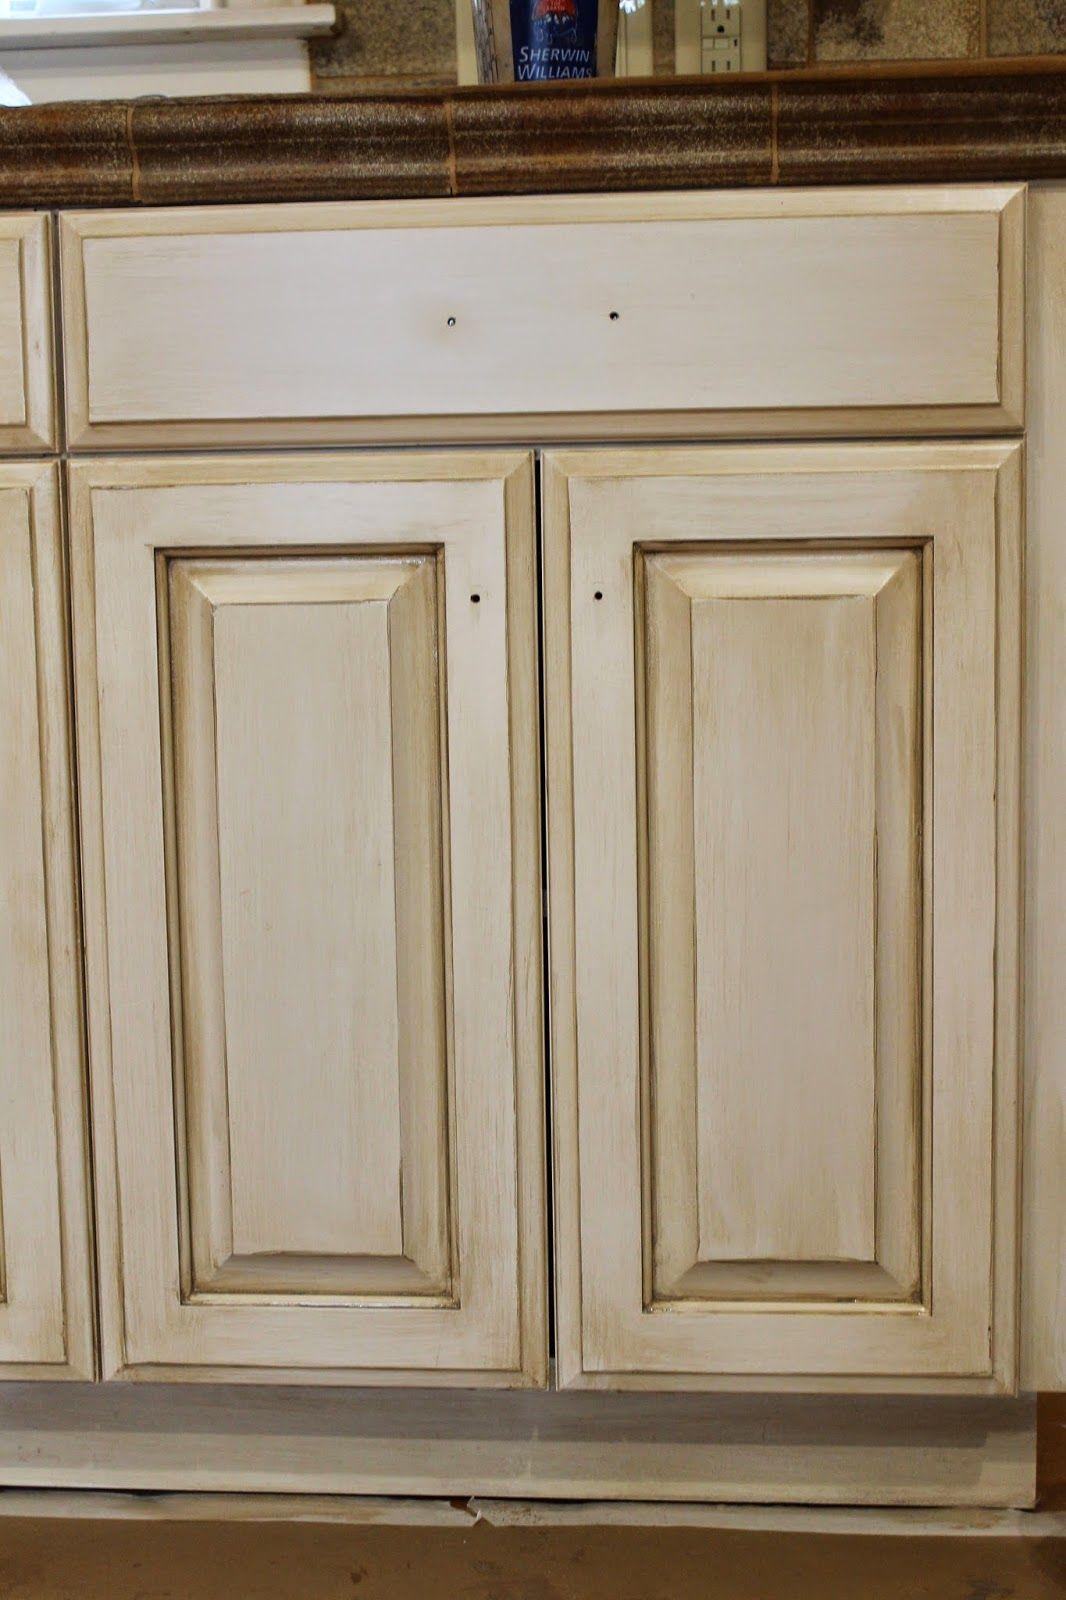 How To Glazing Cabinets Glazing Cabinets Glazed Kitchen Cabinets Kitchen Cabinets Makeover